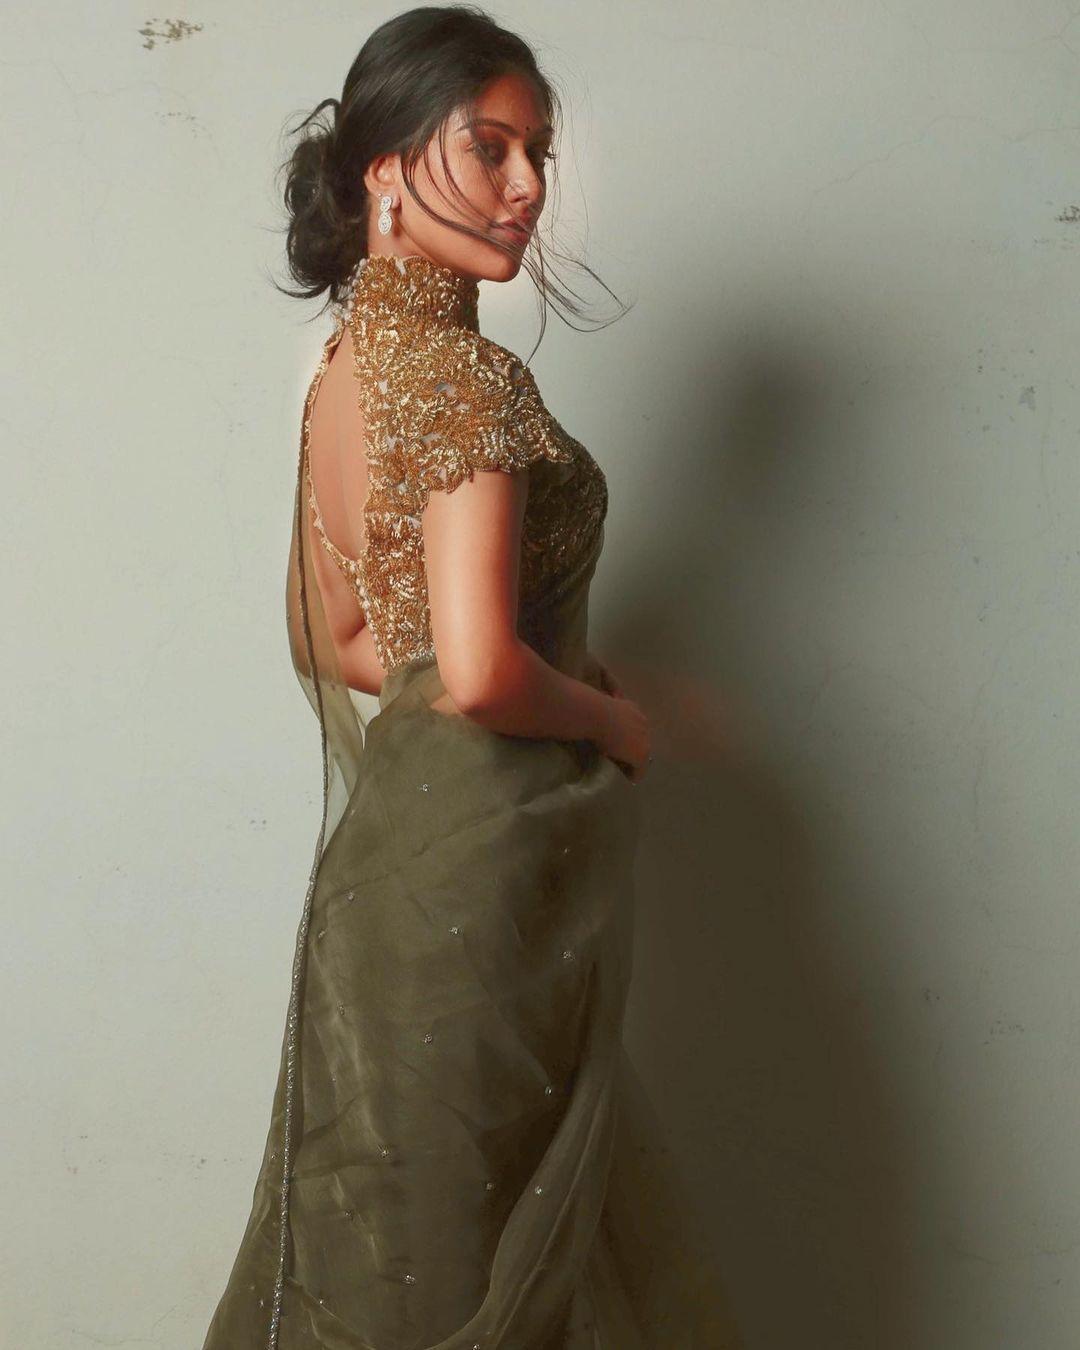 Anu Emmanuel Hot Images and up coming telugu movie news